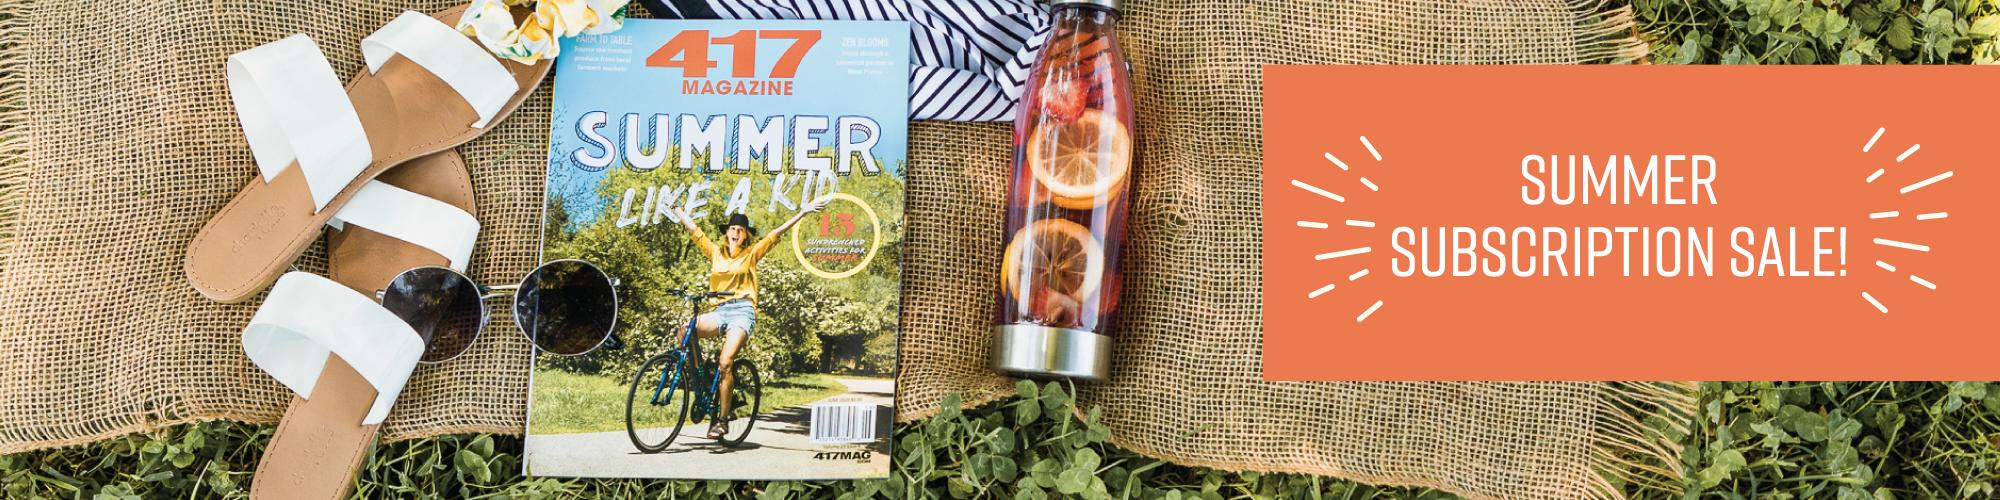 417 Magazine Summer Subscription Sale